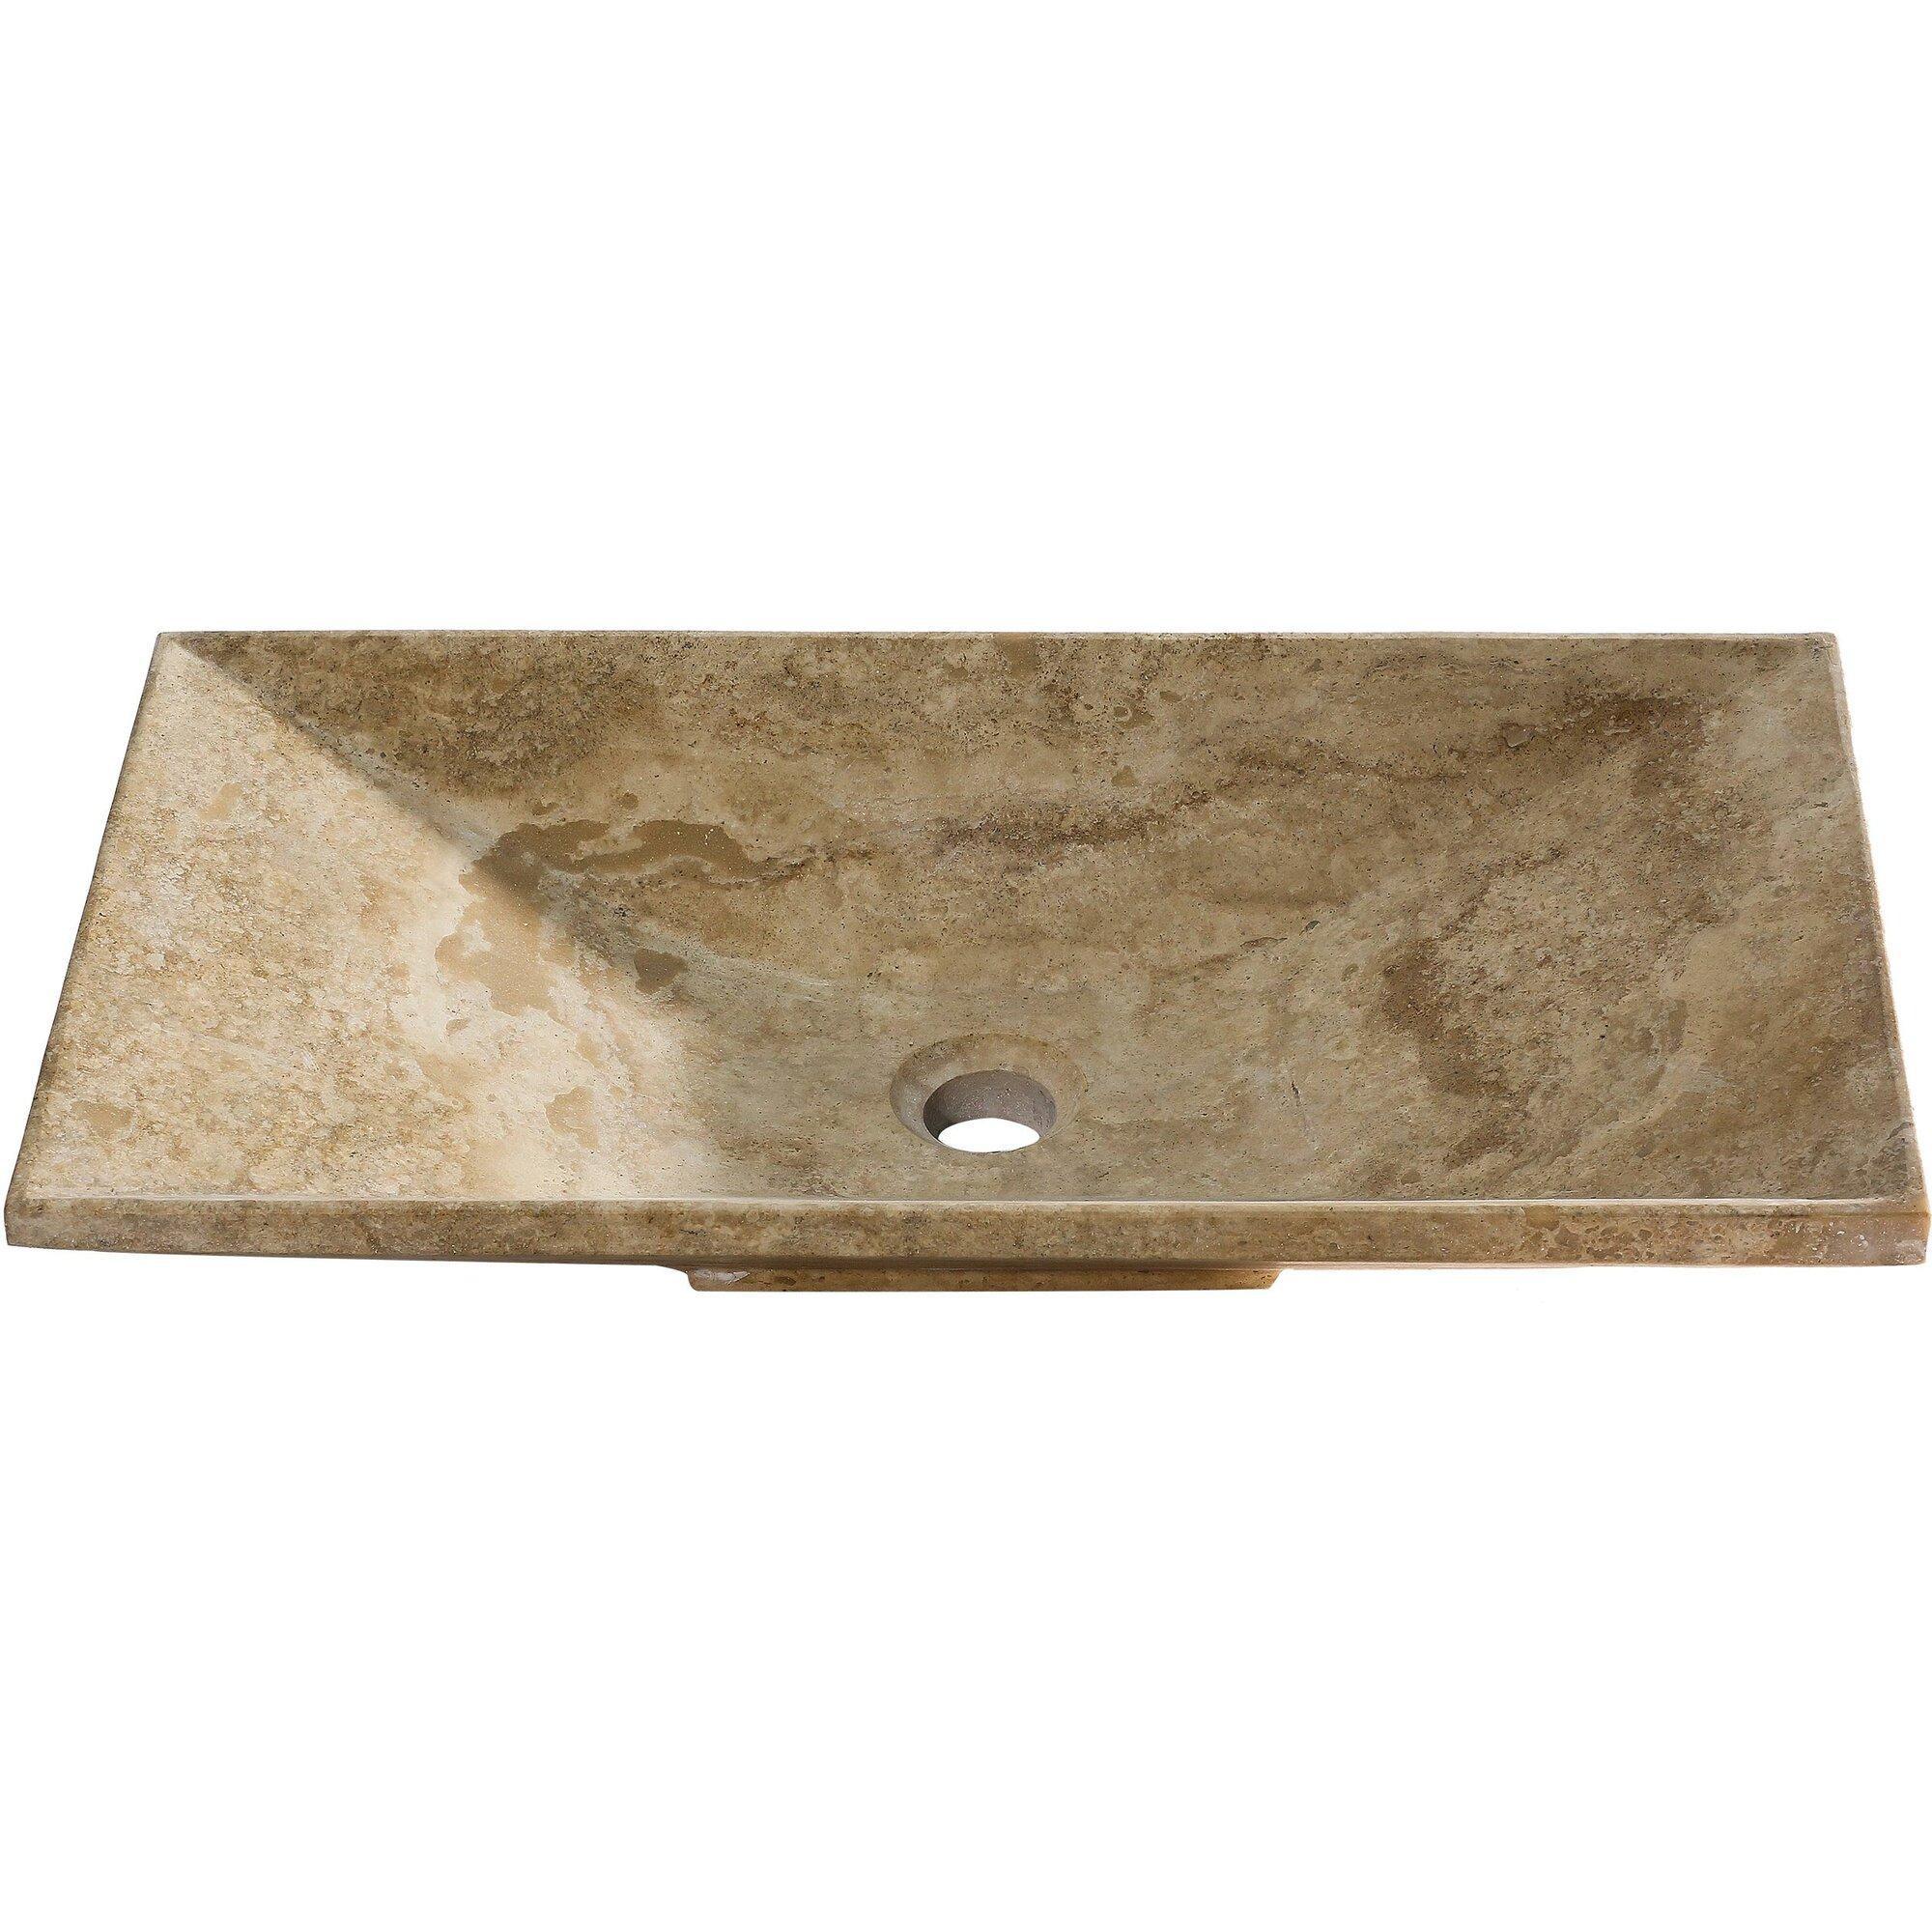 Y decor vicki rectangular vessel bathroom sink wayfair - Rectangular sinks bathroom vessel ...